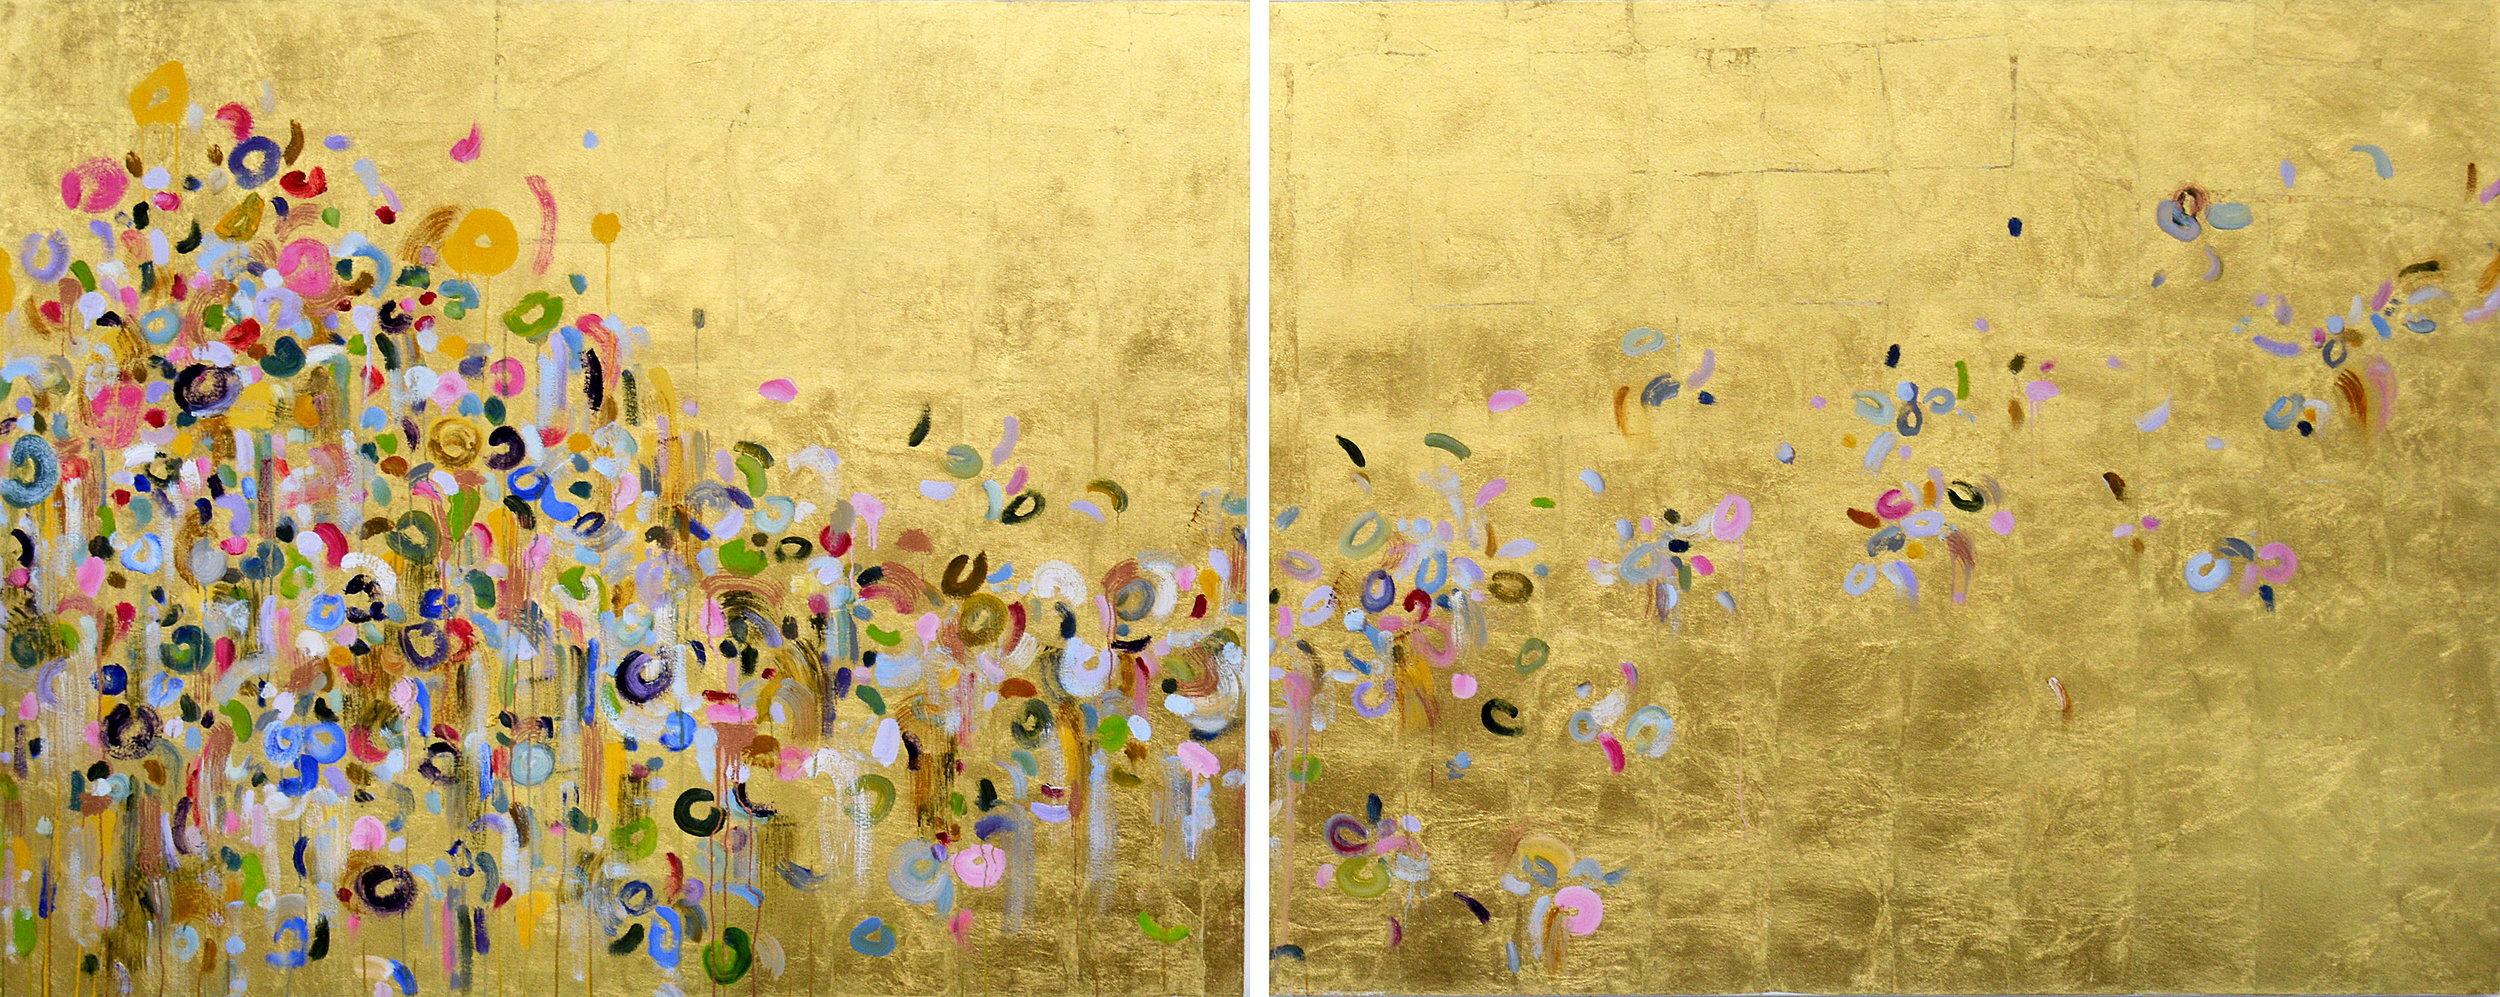 ETERNAL - A New Solo Exhibition by Michelle SakhaiApril 25 - 30, 2018Palette Gallery, Tokyo2 Chome-94 Azabujuban, Minato, Tokyo 106-0045, Japan